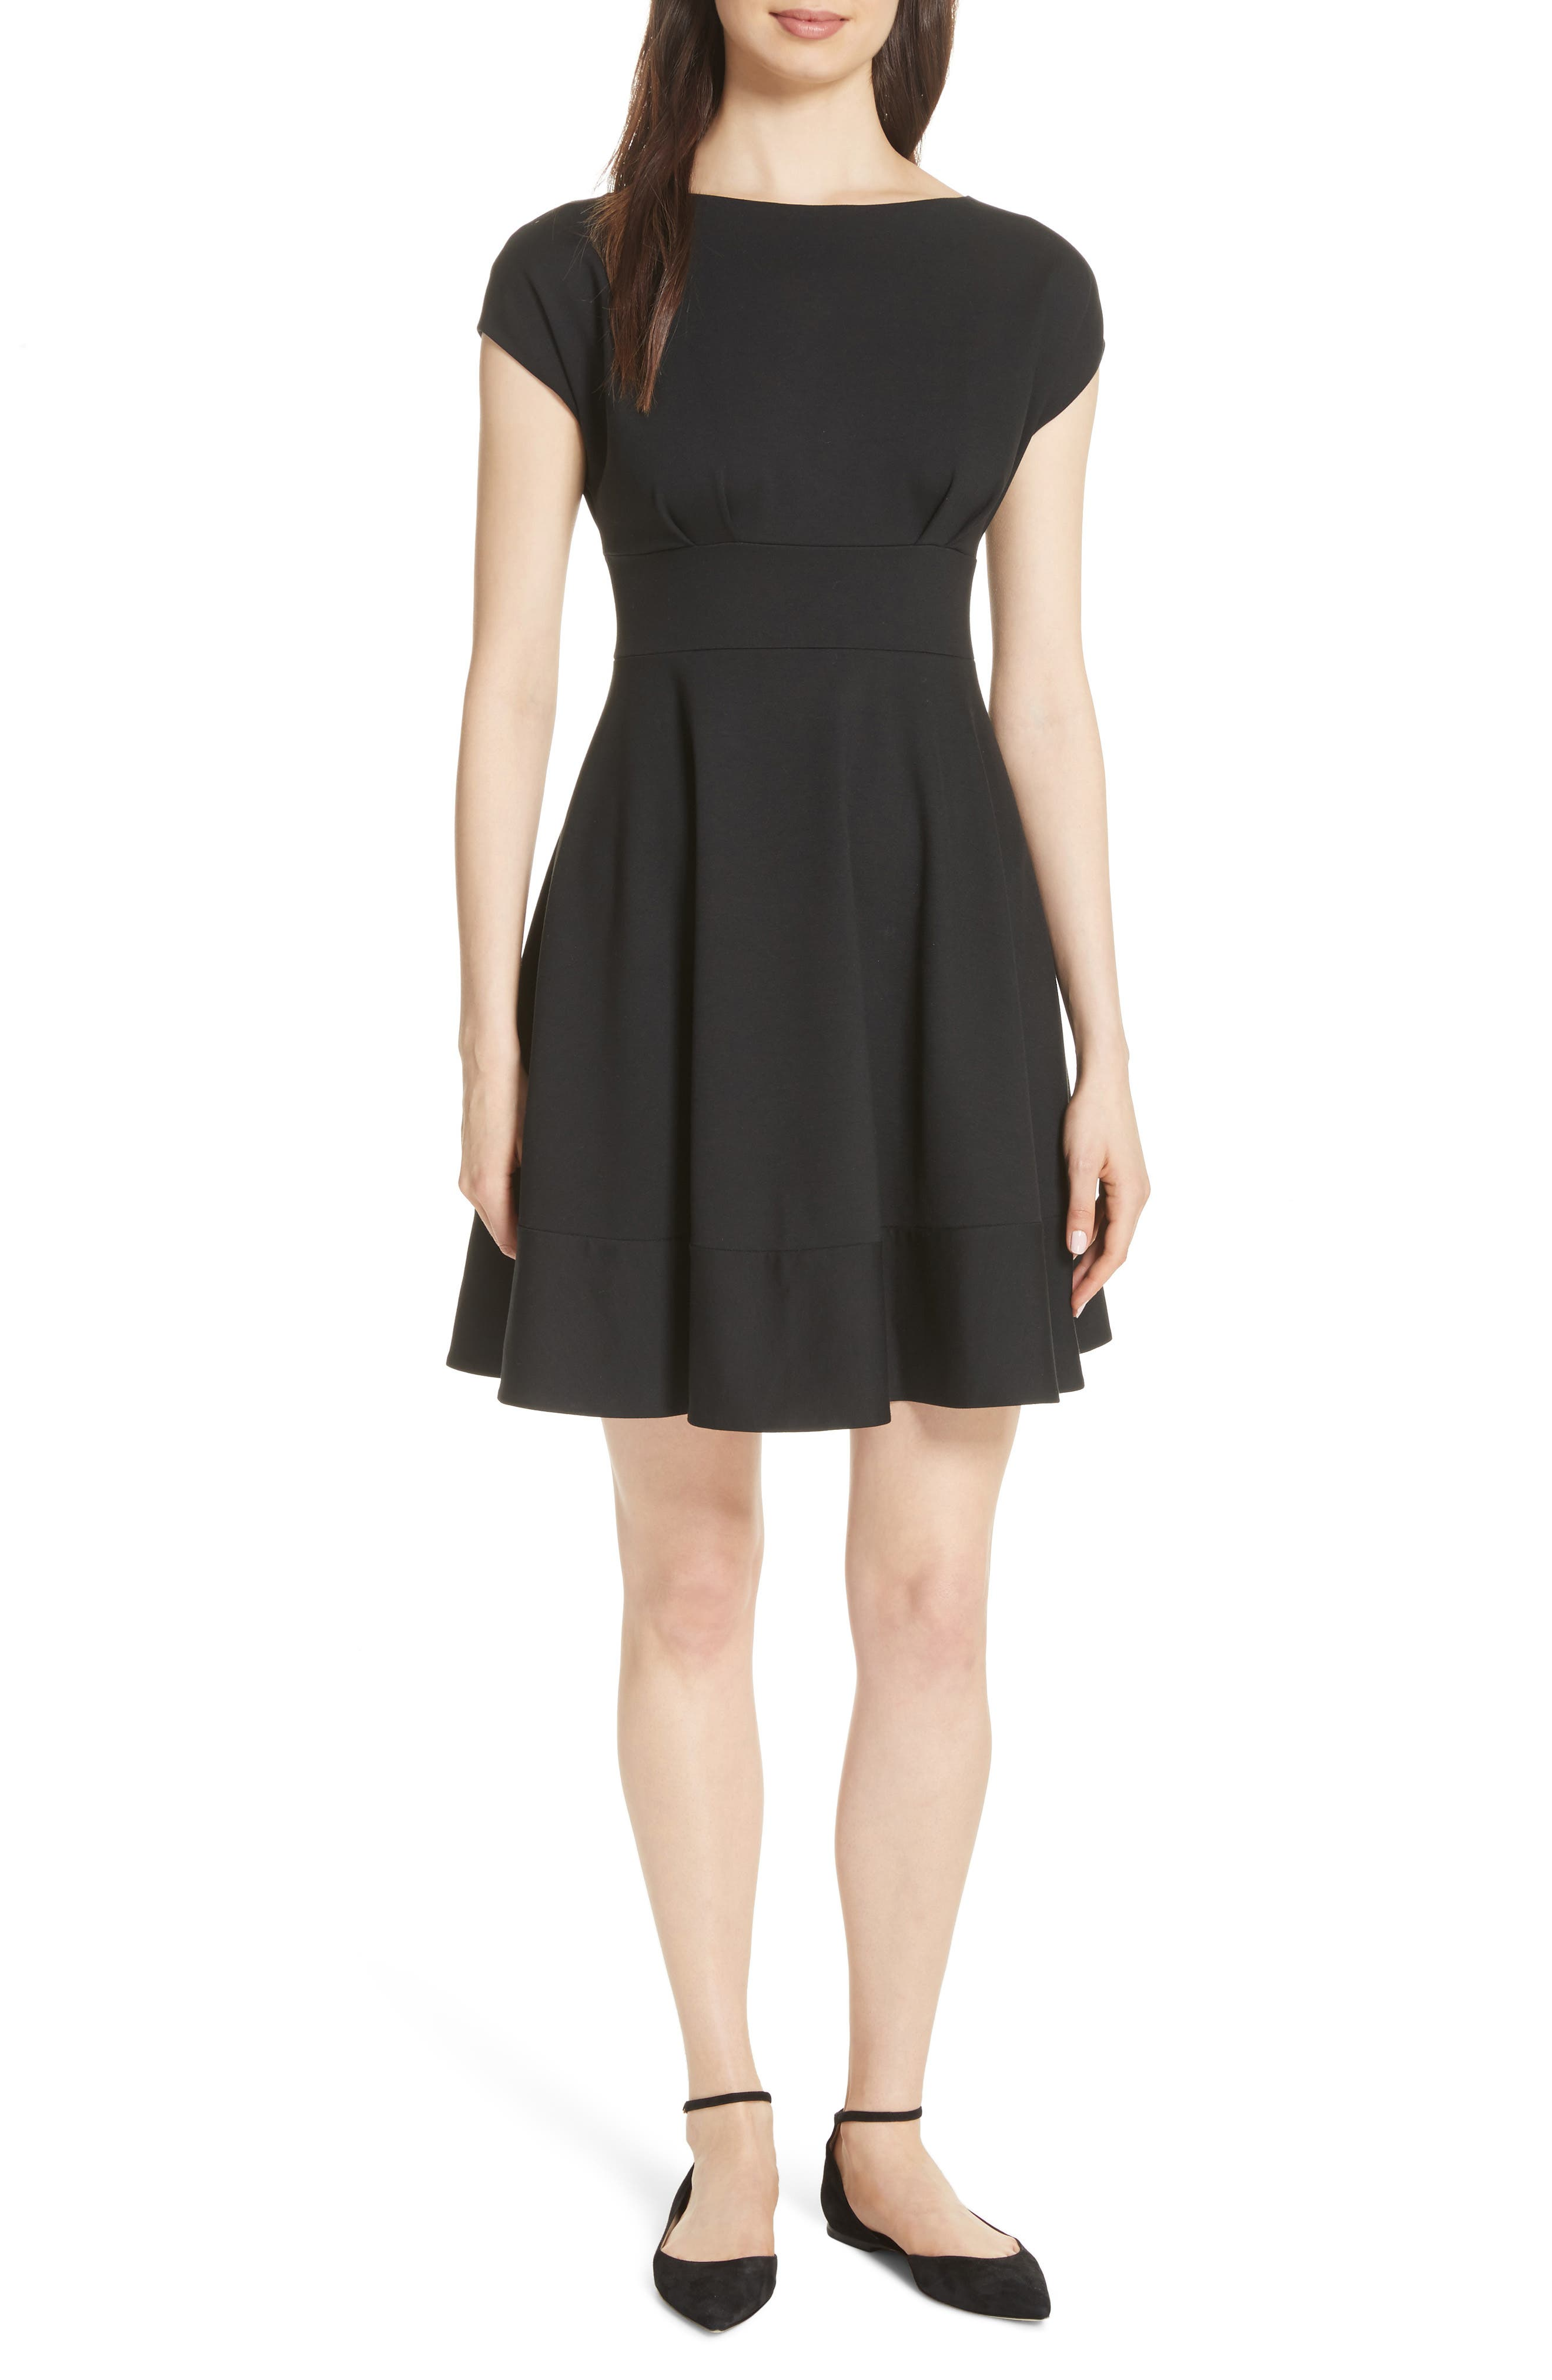 Kate Spade New York Ponte Fiorella Fit & Flare Dress, Black